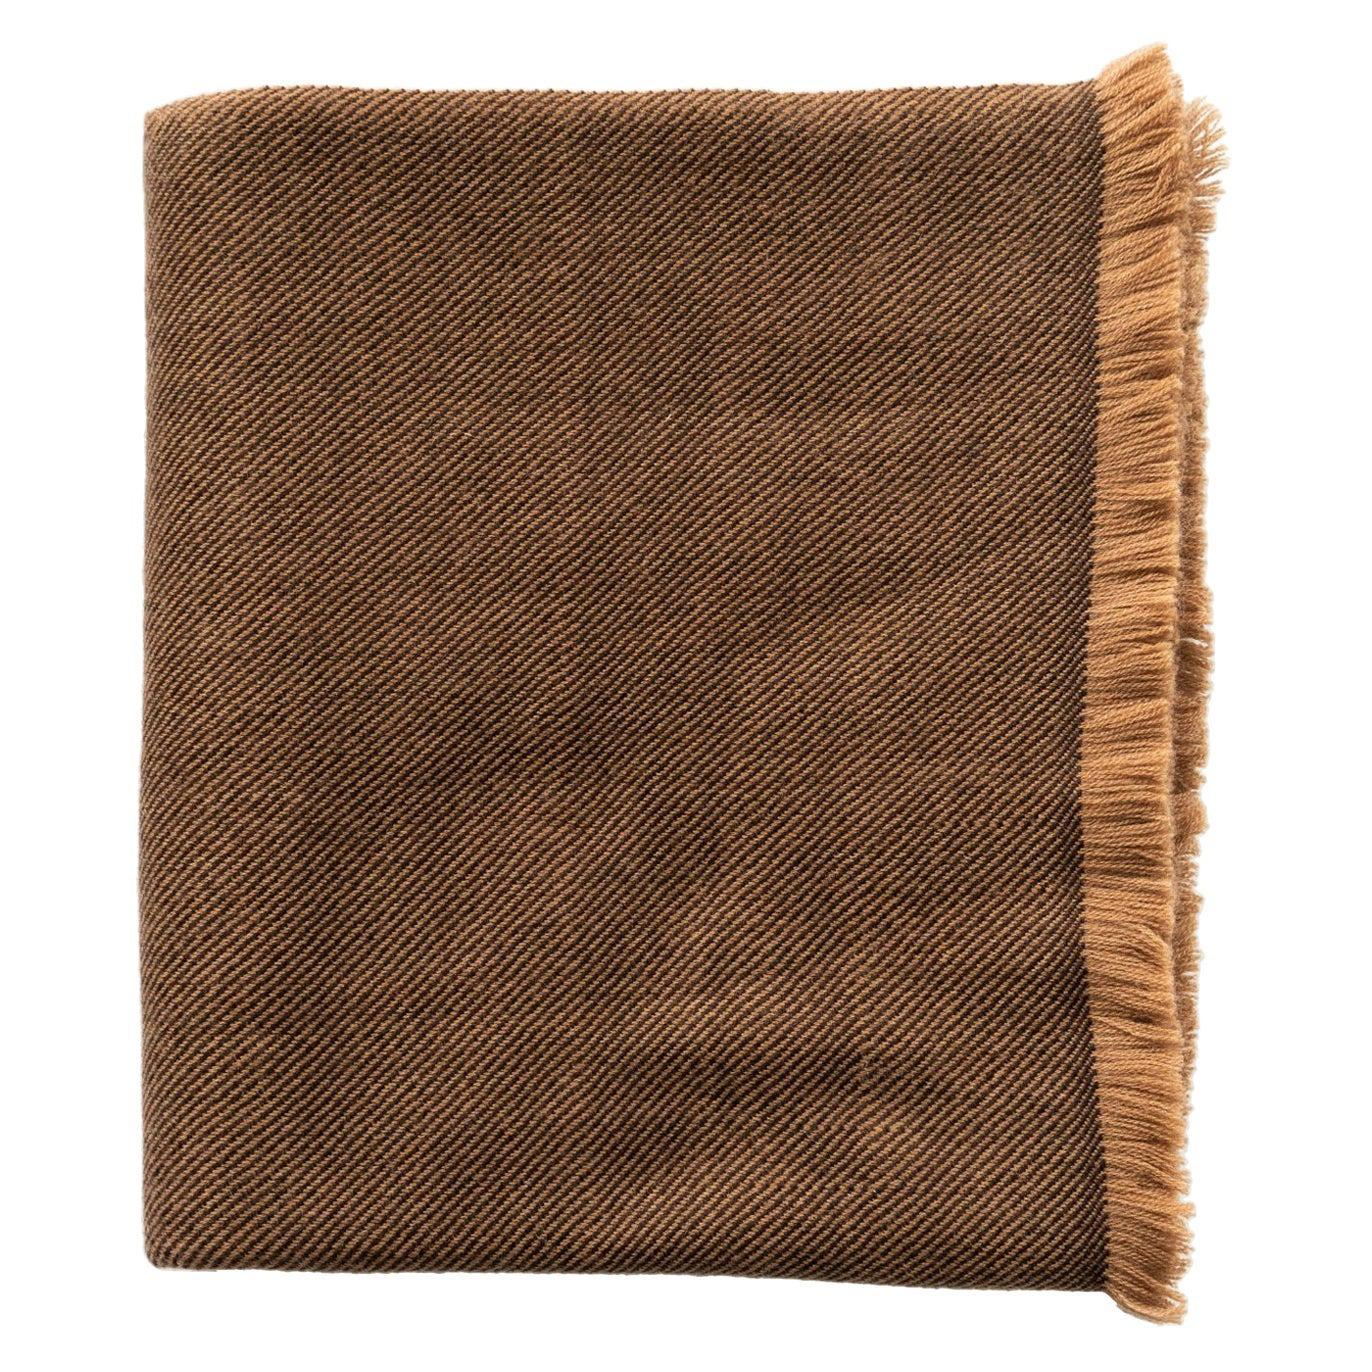 Hay, Warm Brown Shade Queen Size Bedspread / Coverlet Handwoven in Soft Merino